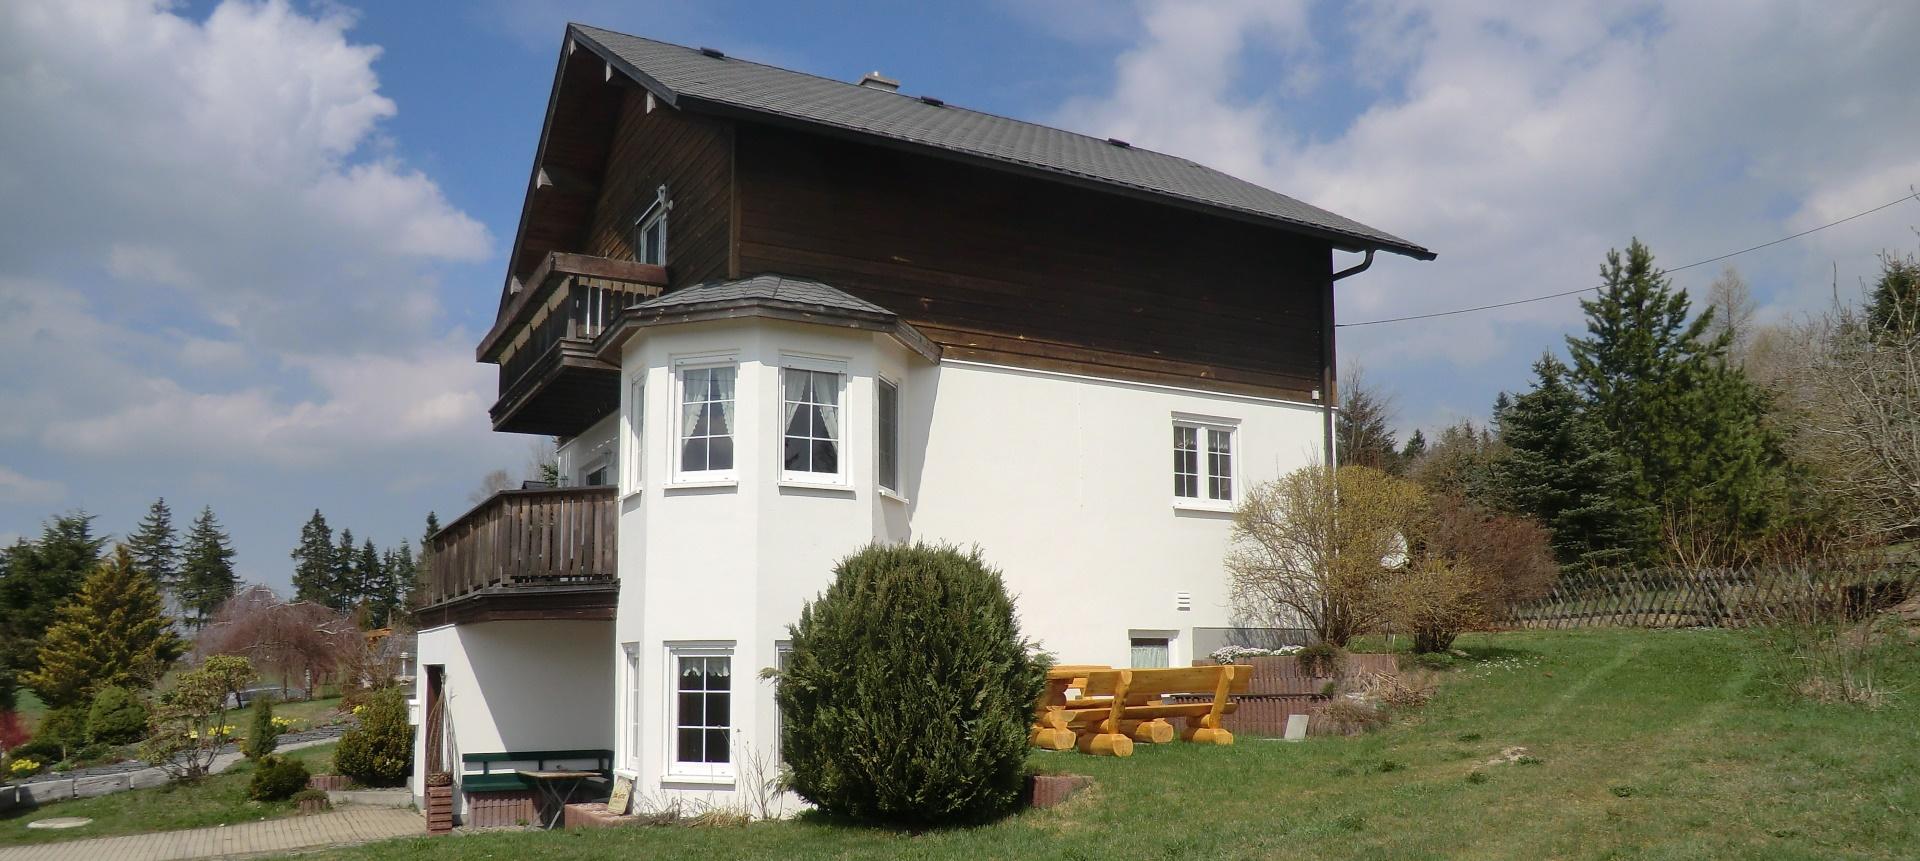 Ferienhaus Windrad